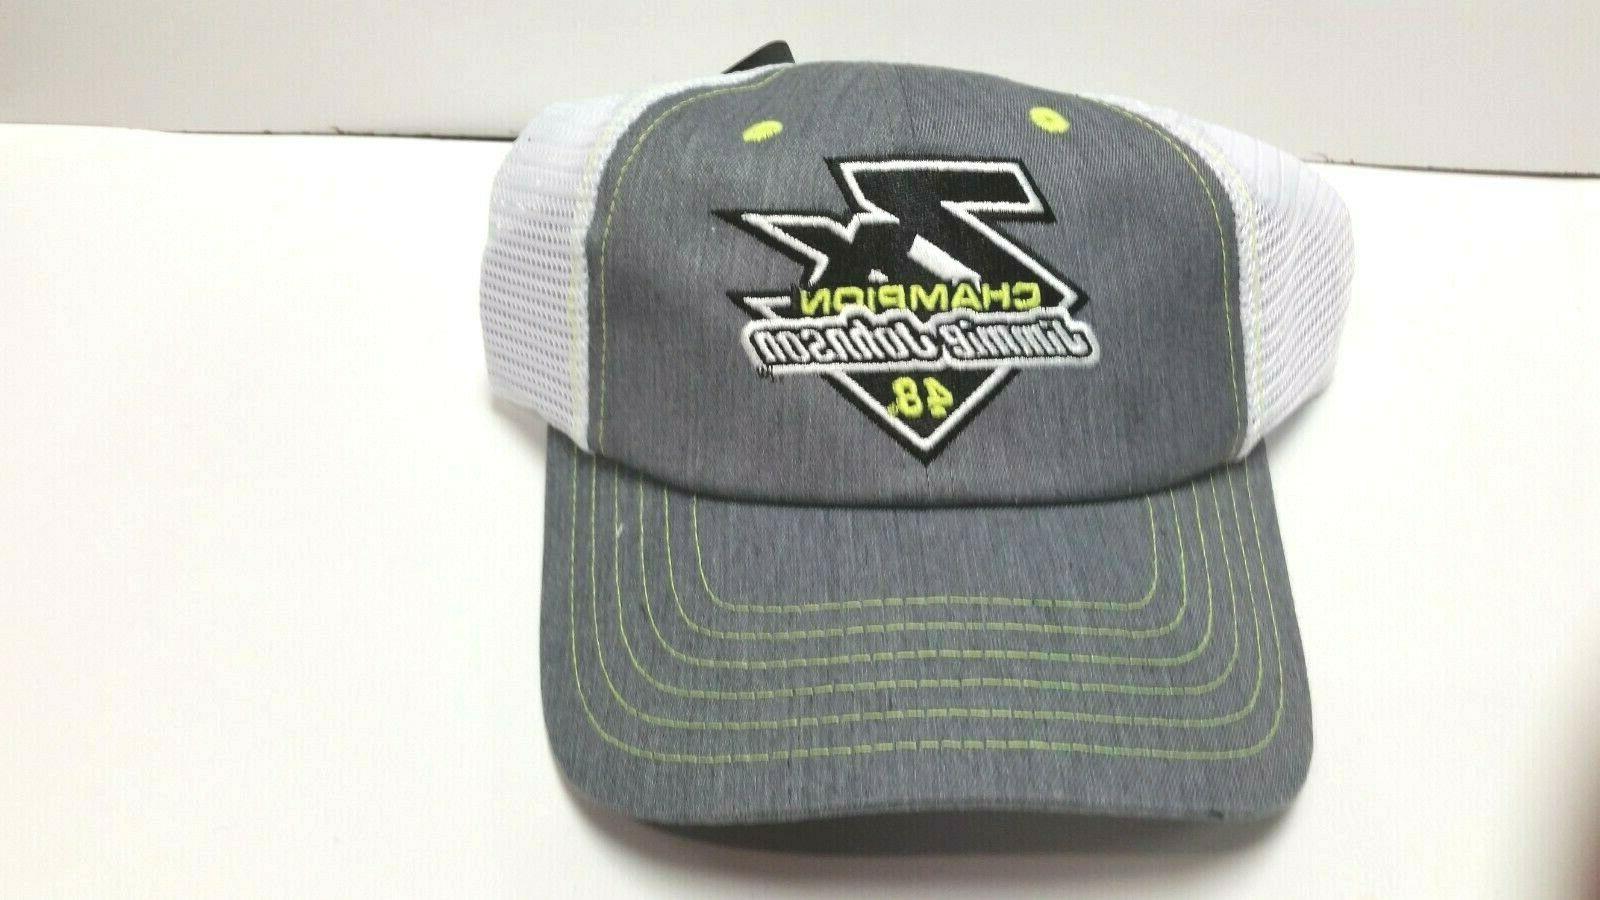 2020 jimmie johnson 7x champion trucker mesh